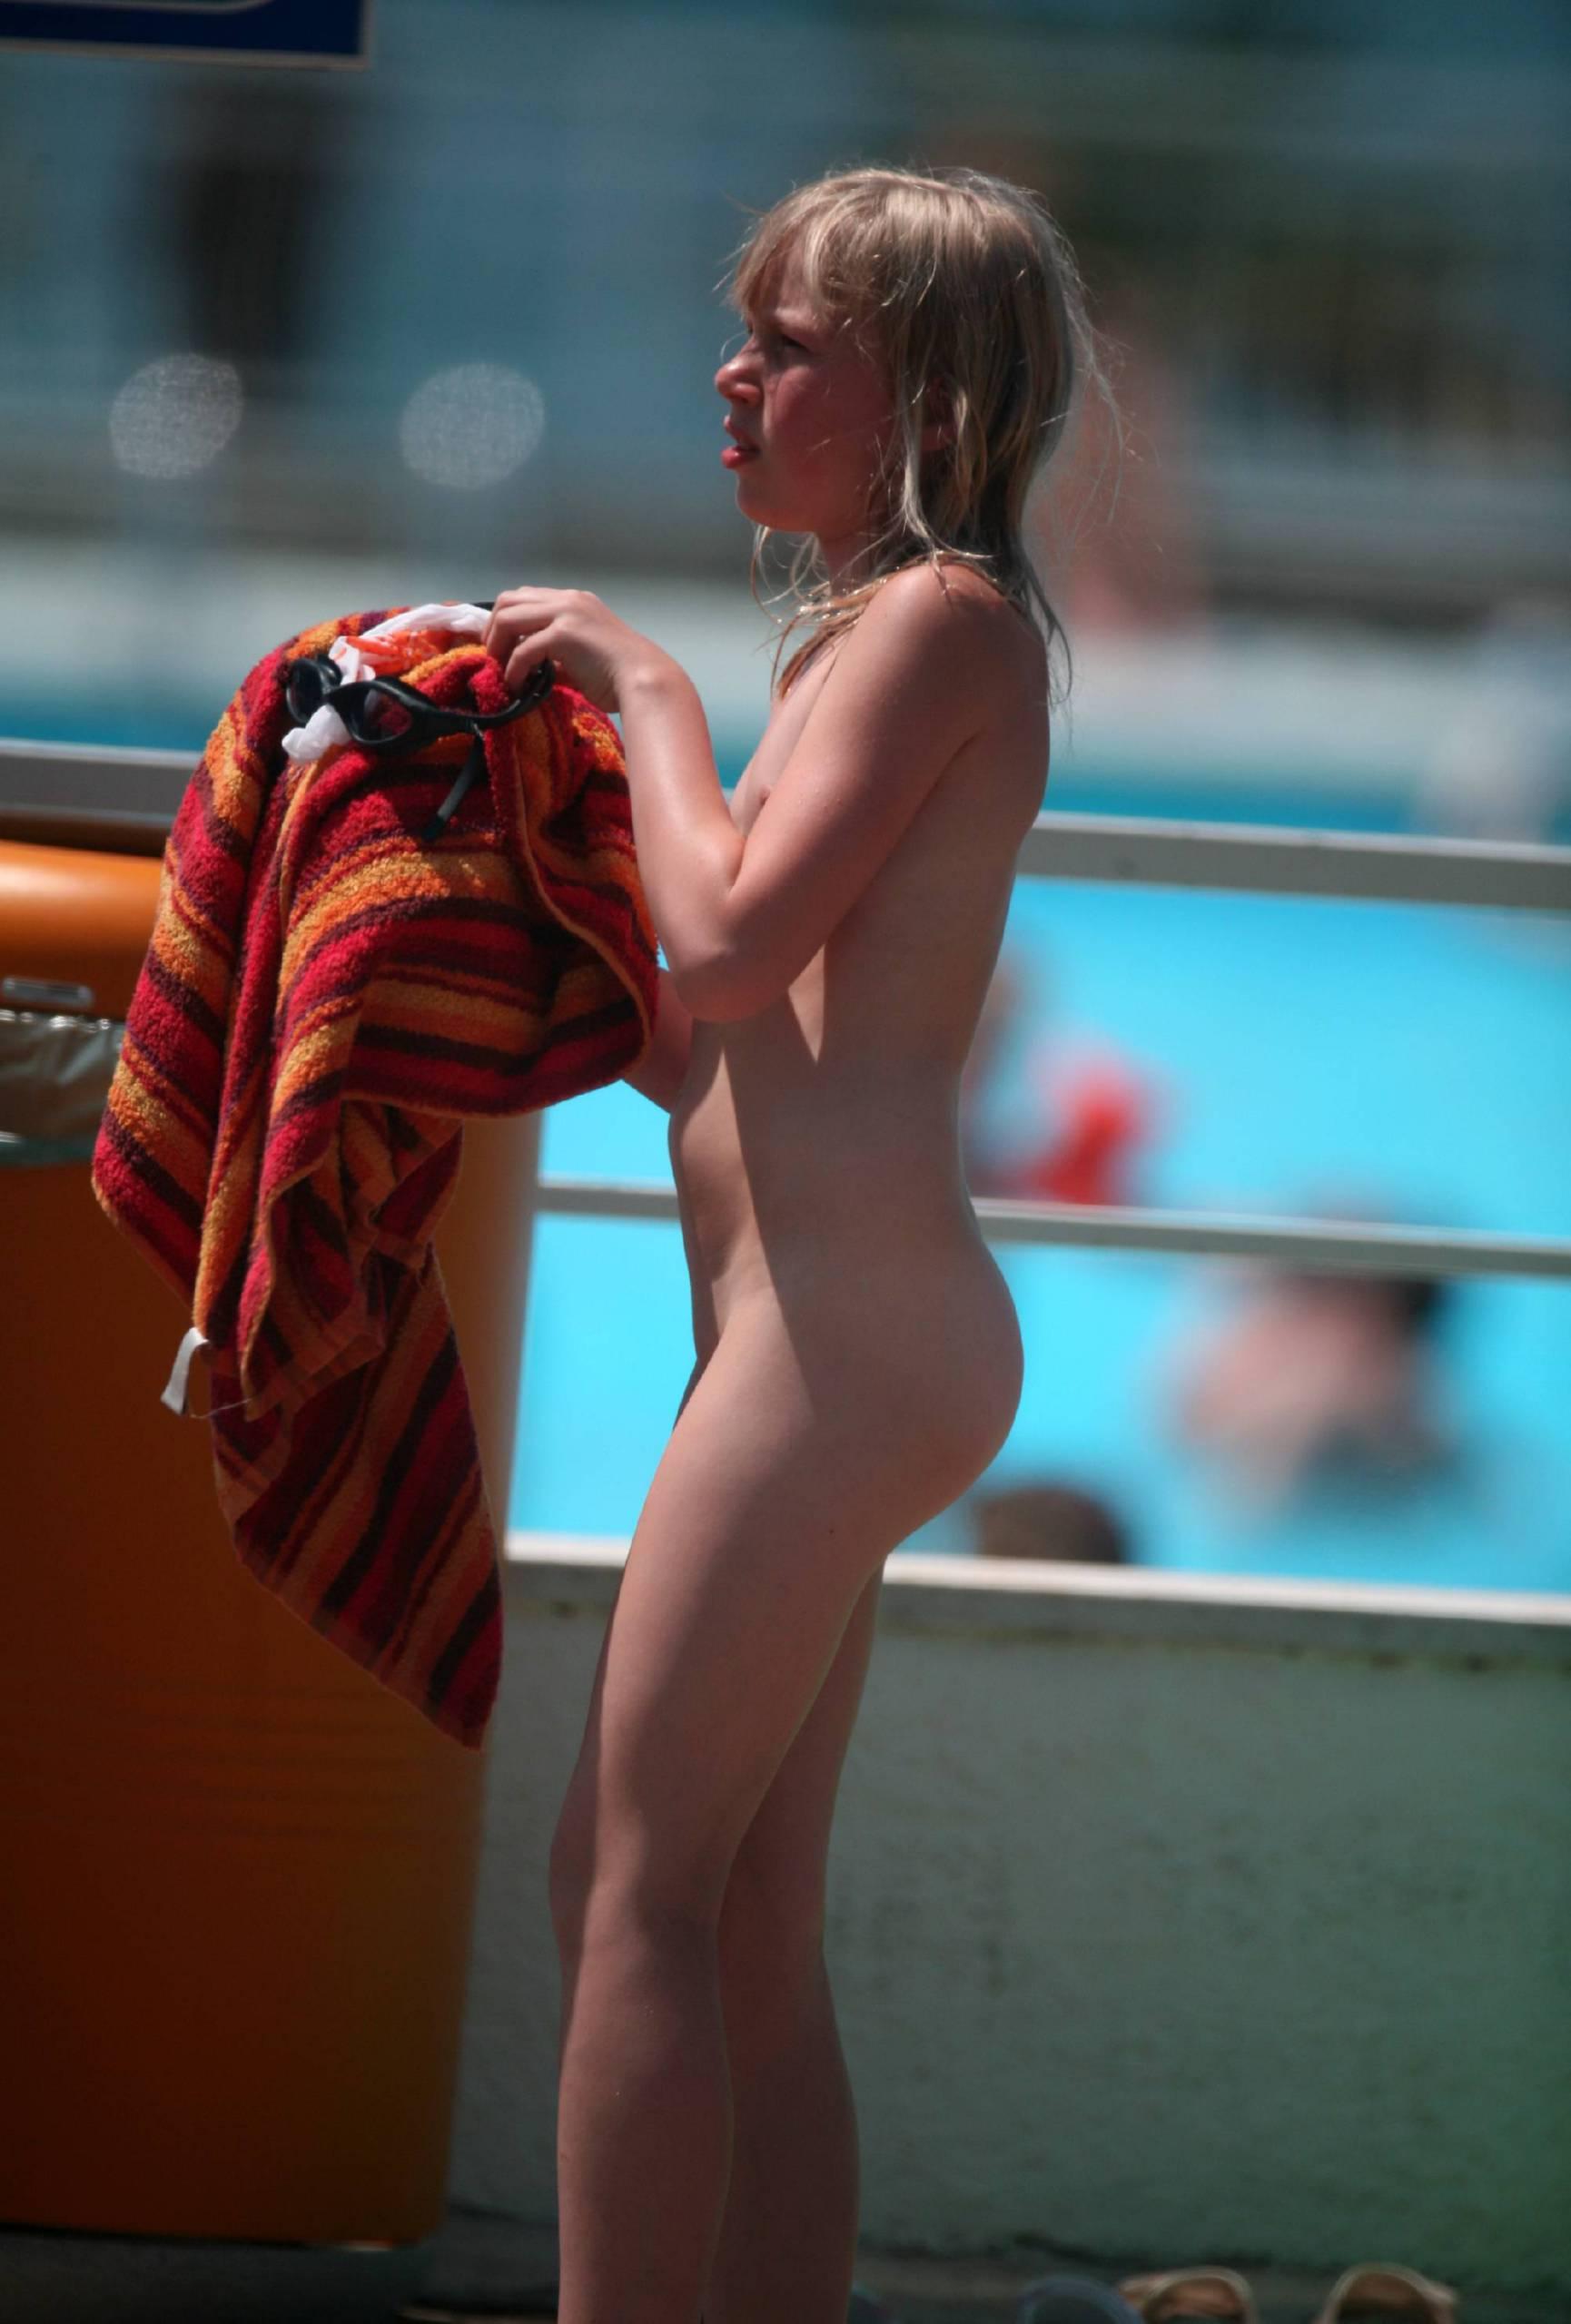 Nudist Pool Resort Towel - 1